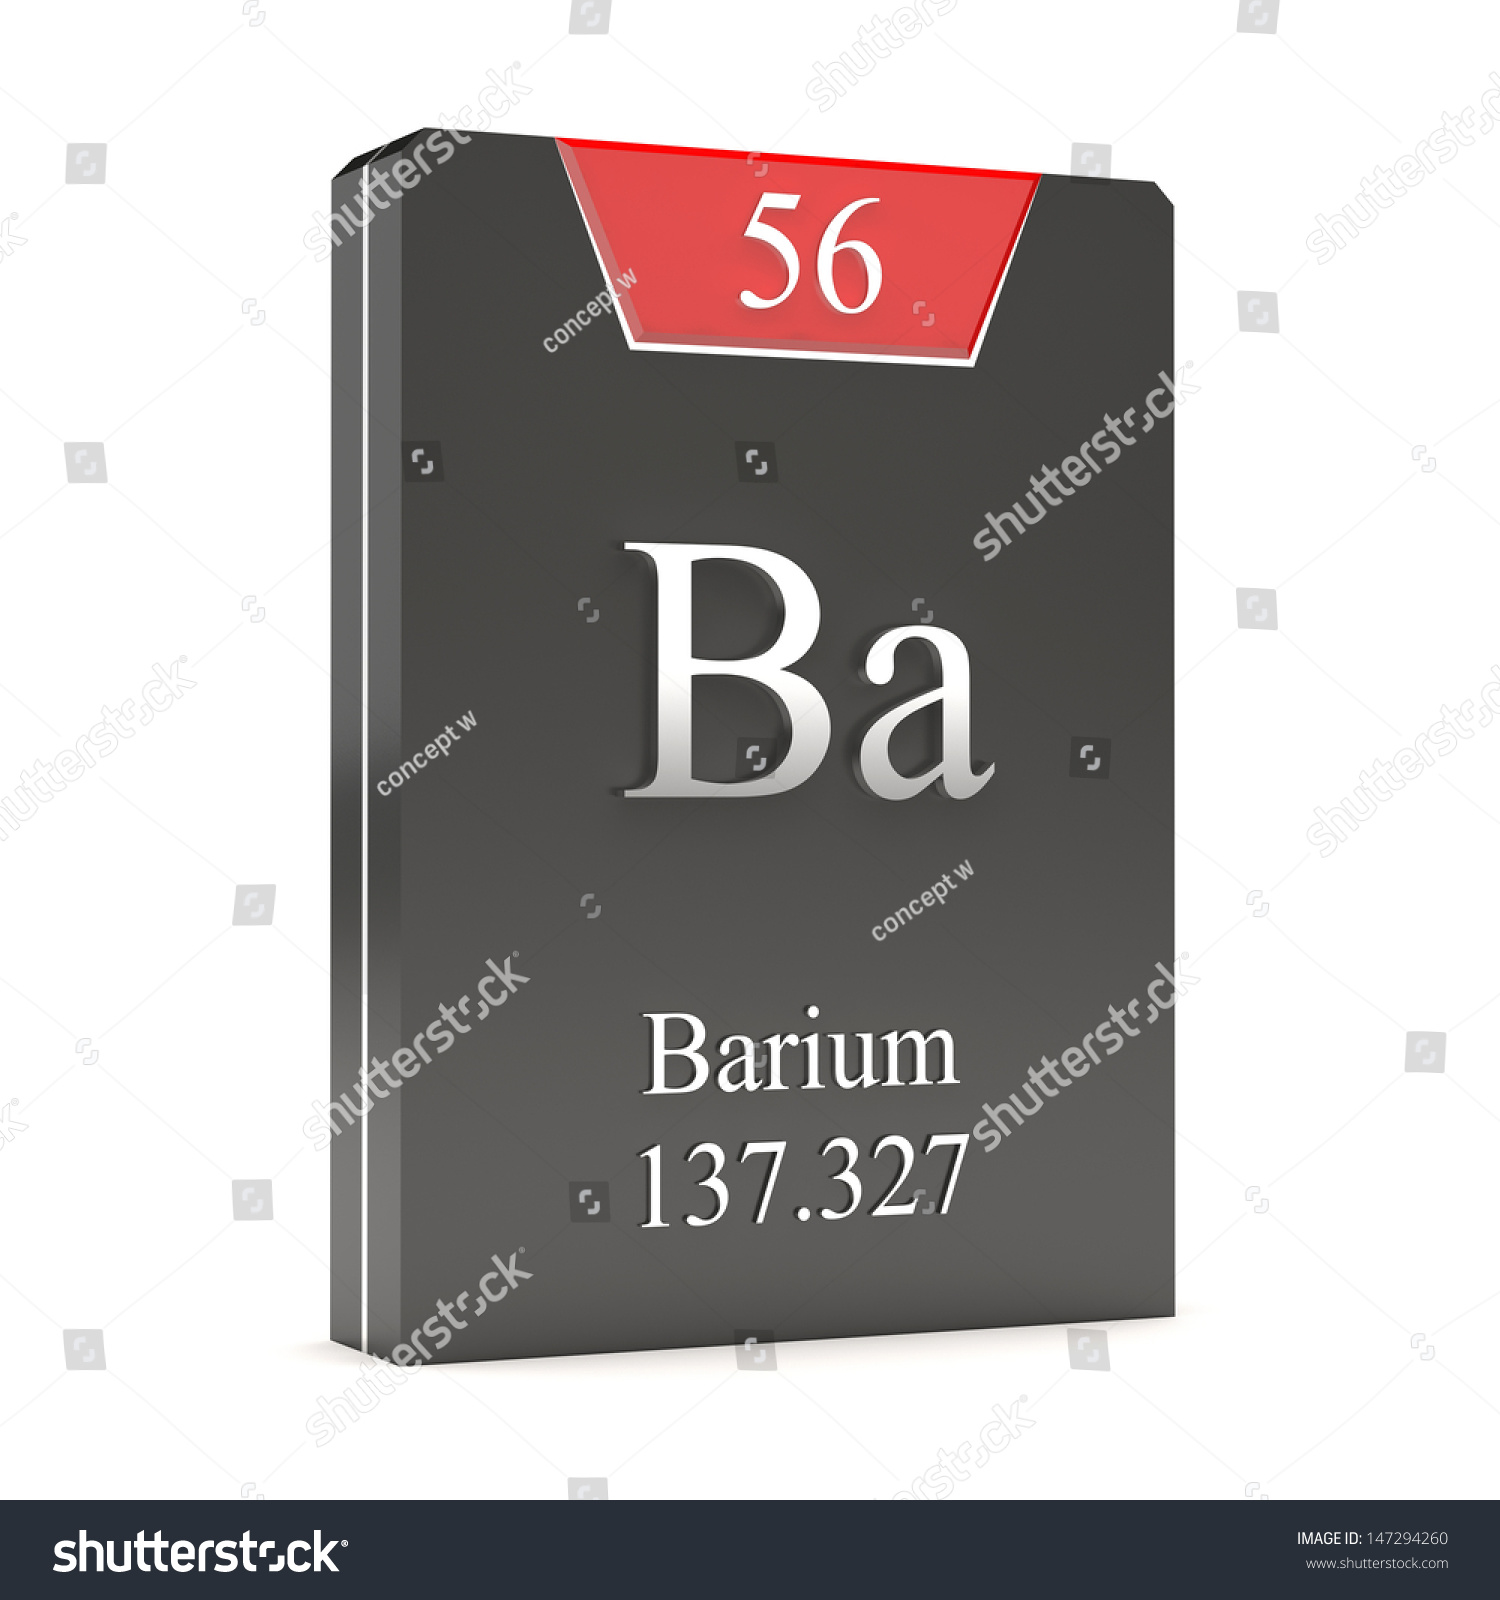 Barium Ba 56 Periodic Table Stock Illustration 147294260 Shutterstock